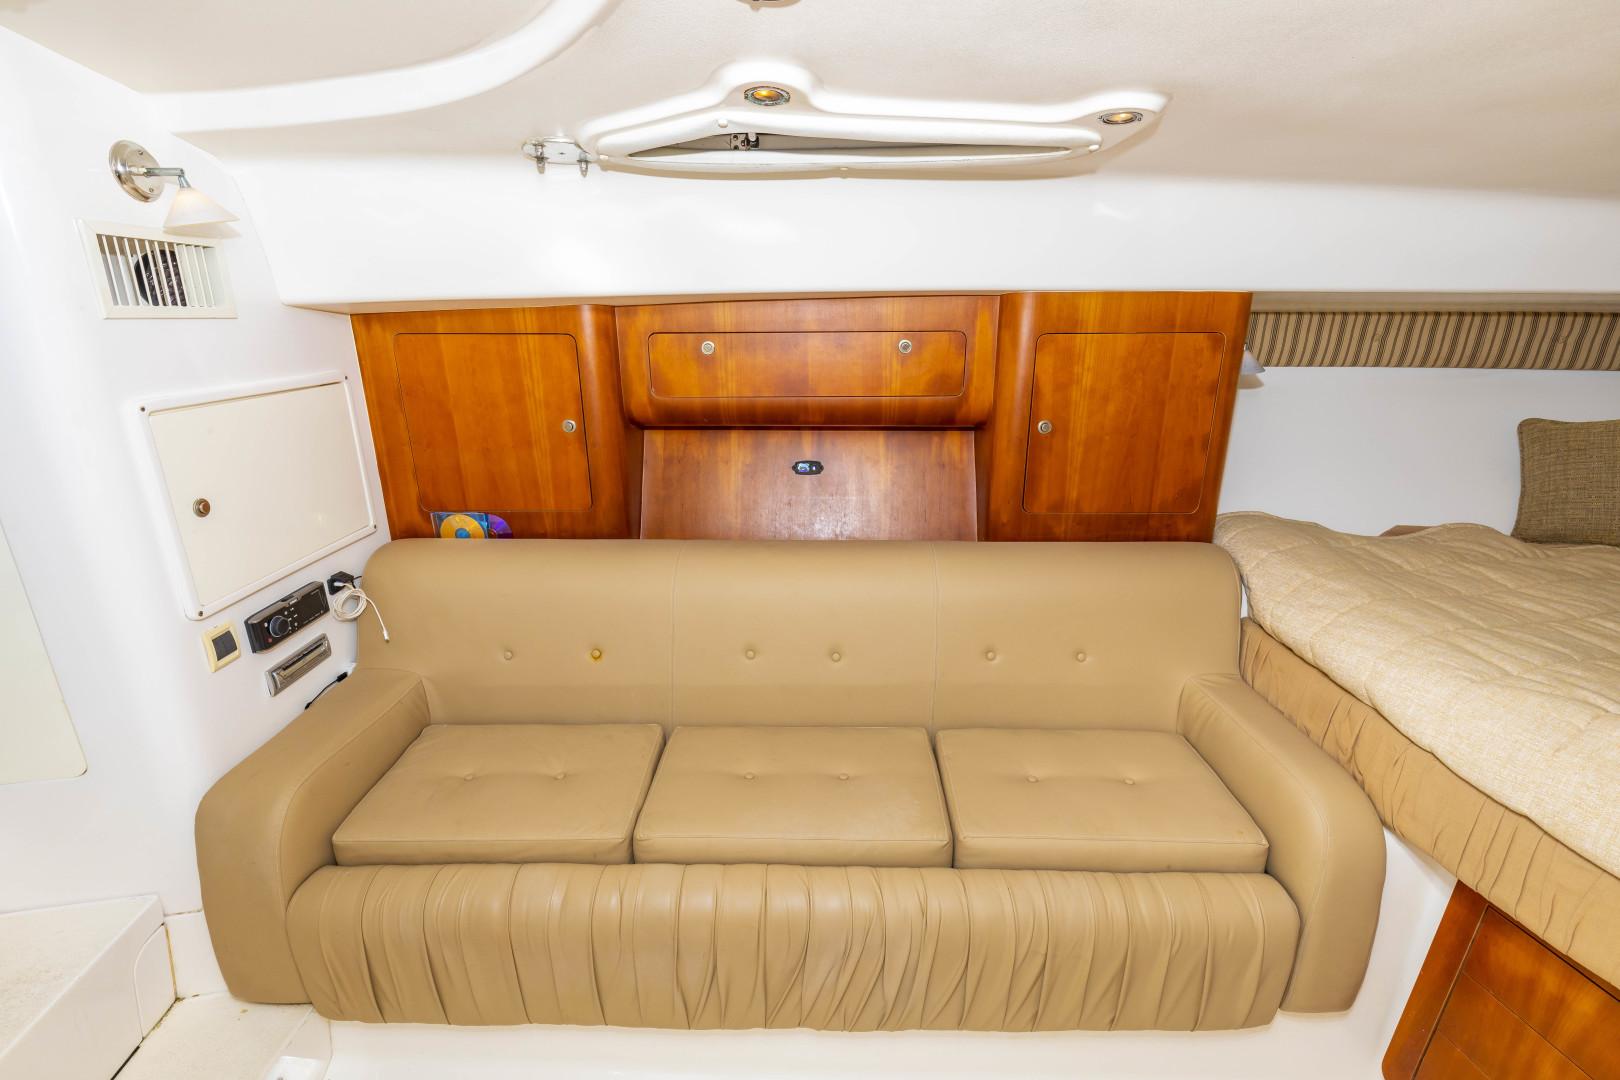 Intrepid-377 Walkaround 2005-Rock Boat REFIT 2018 Dania Beach-Florida-United States-377 Intrepid Couch 2-1511540 | Thumbnail